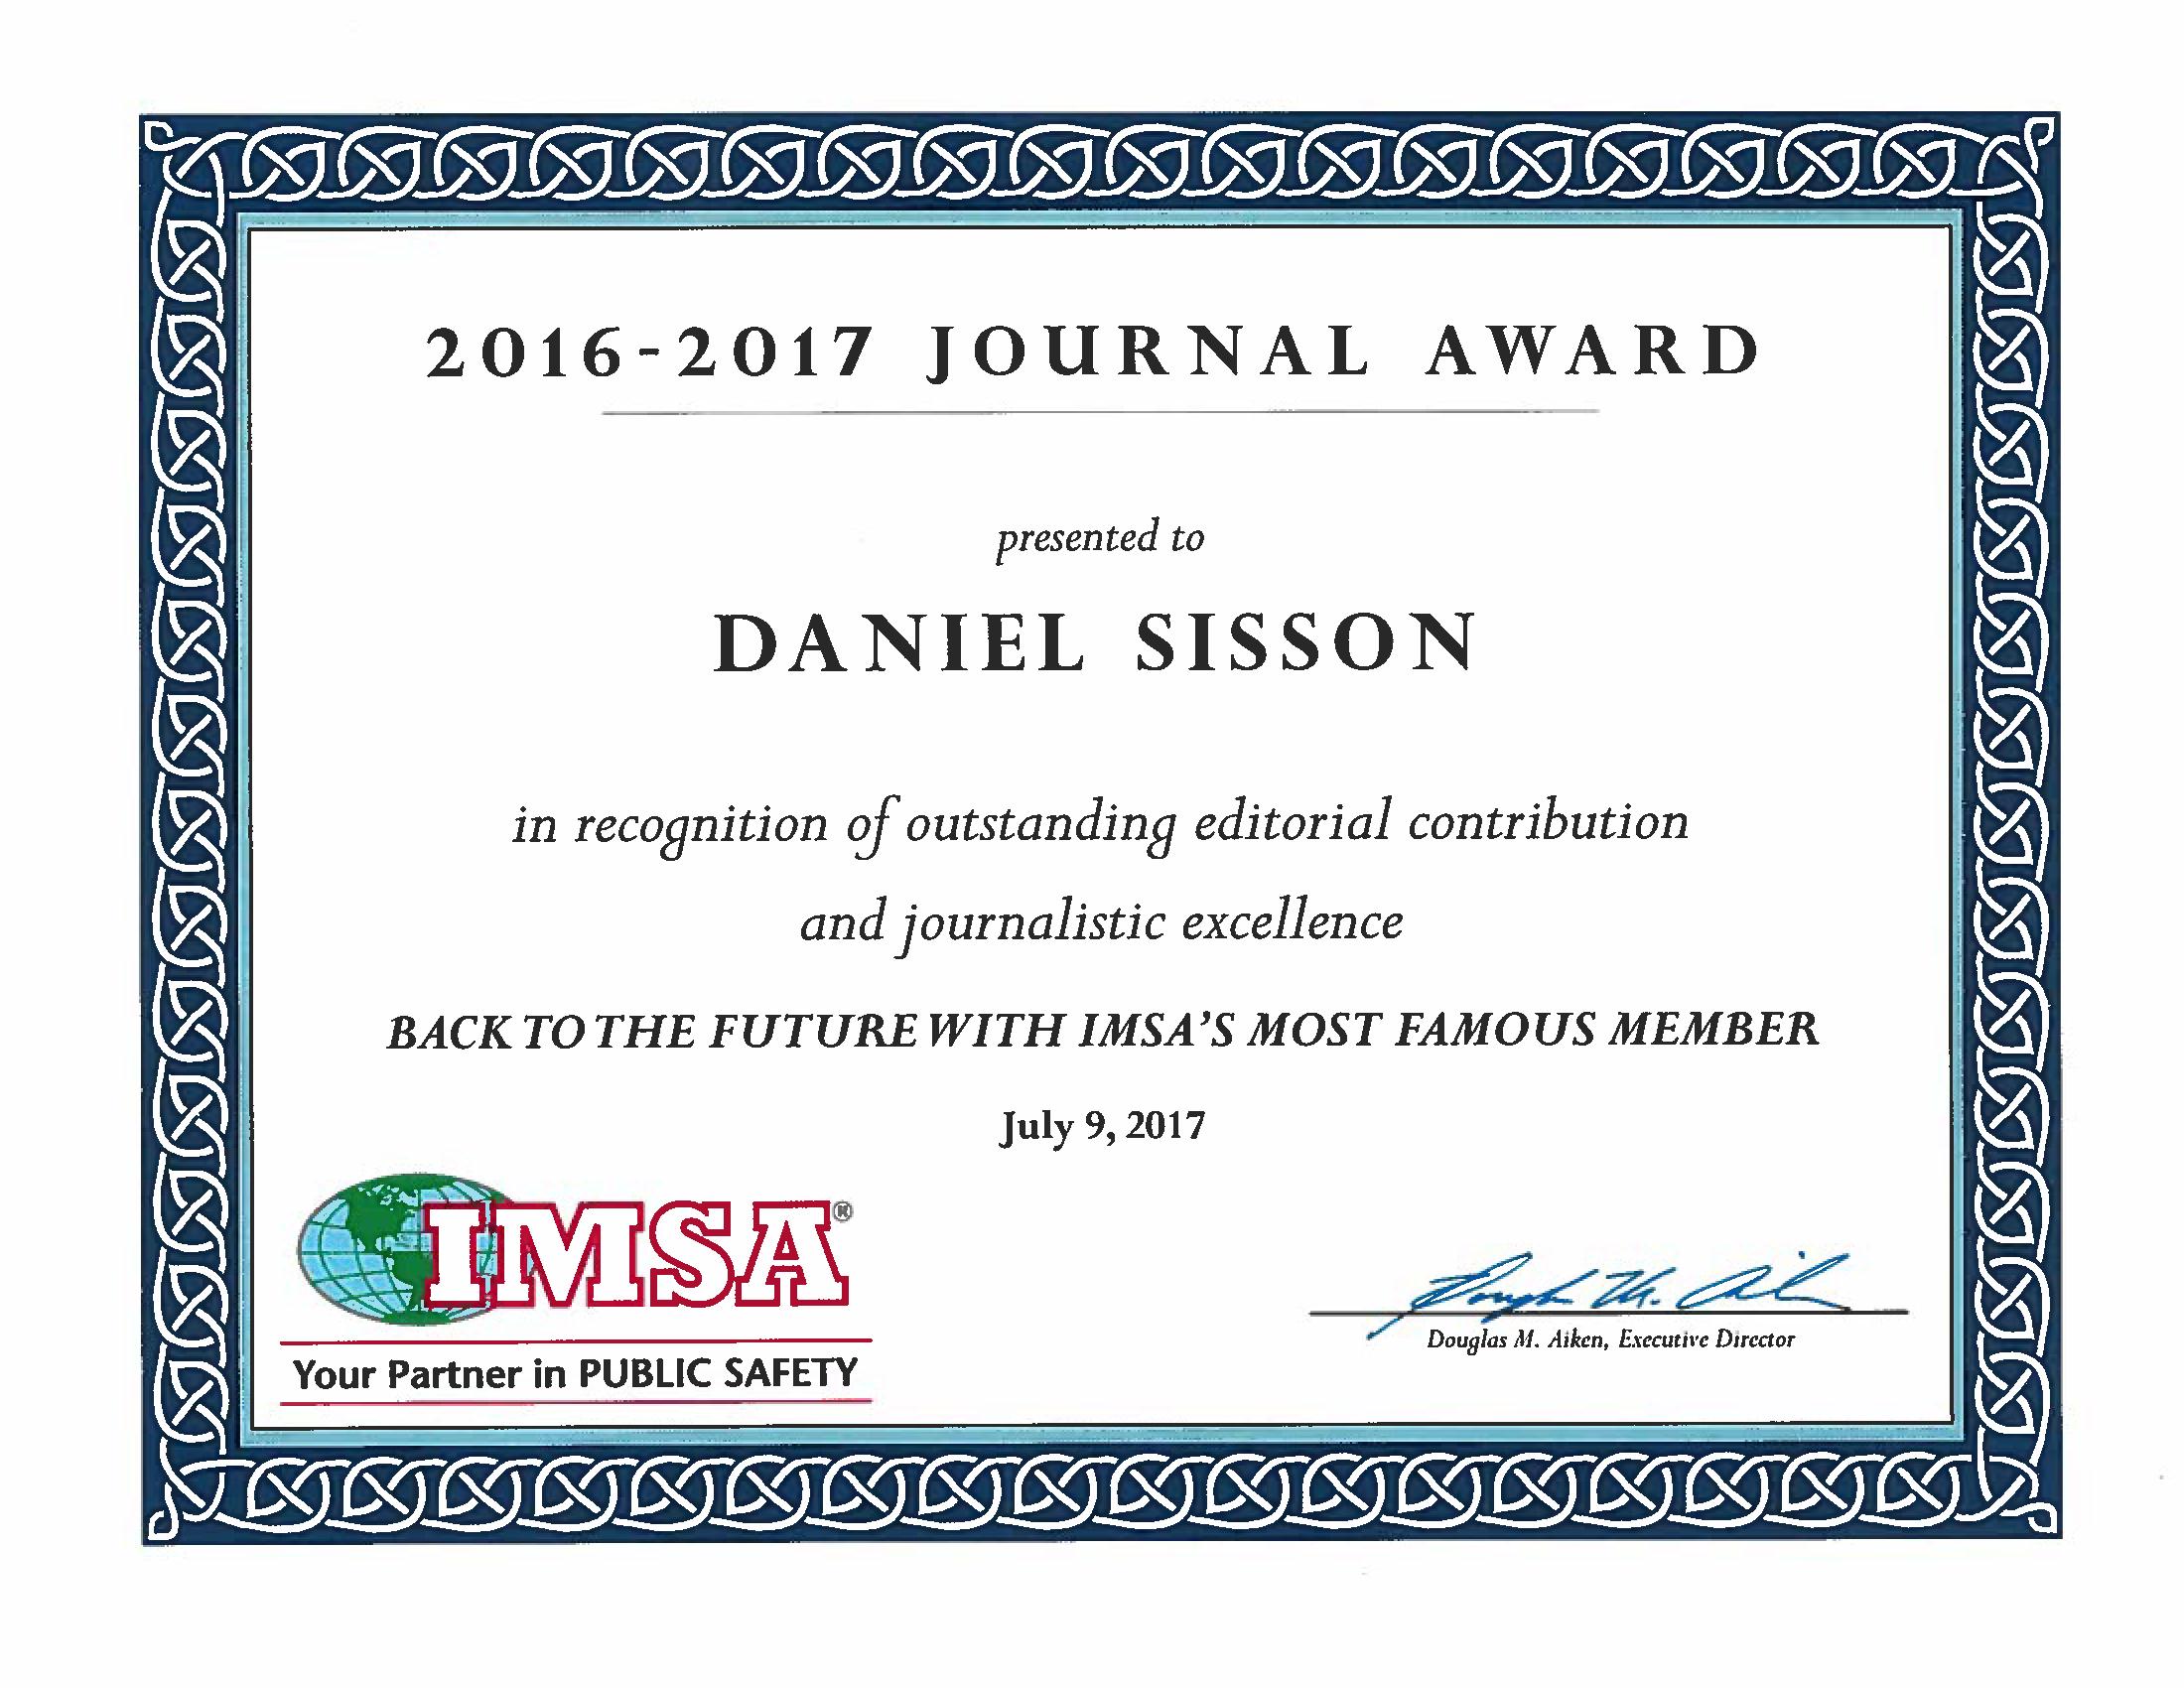 2016-2017 Journal Award.png